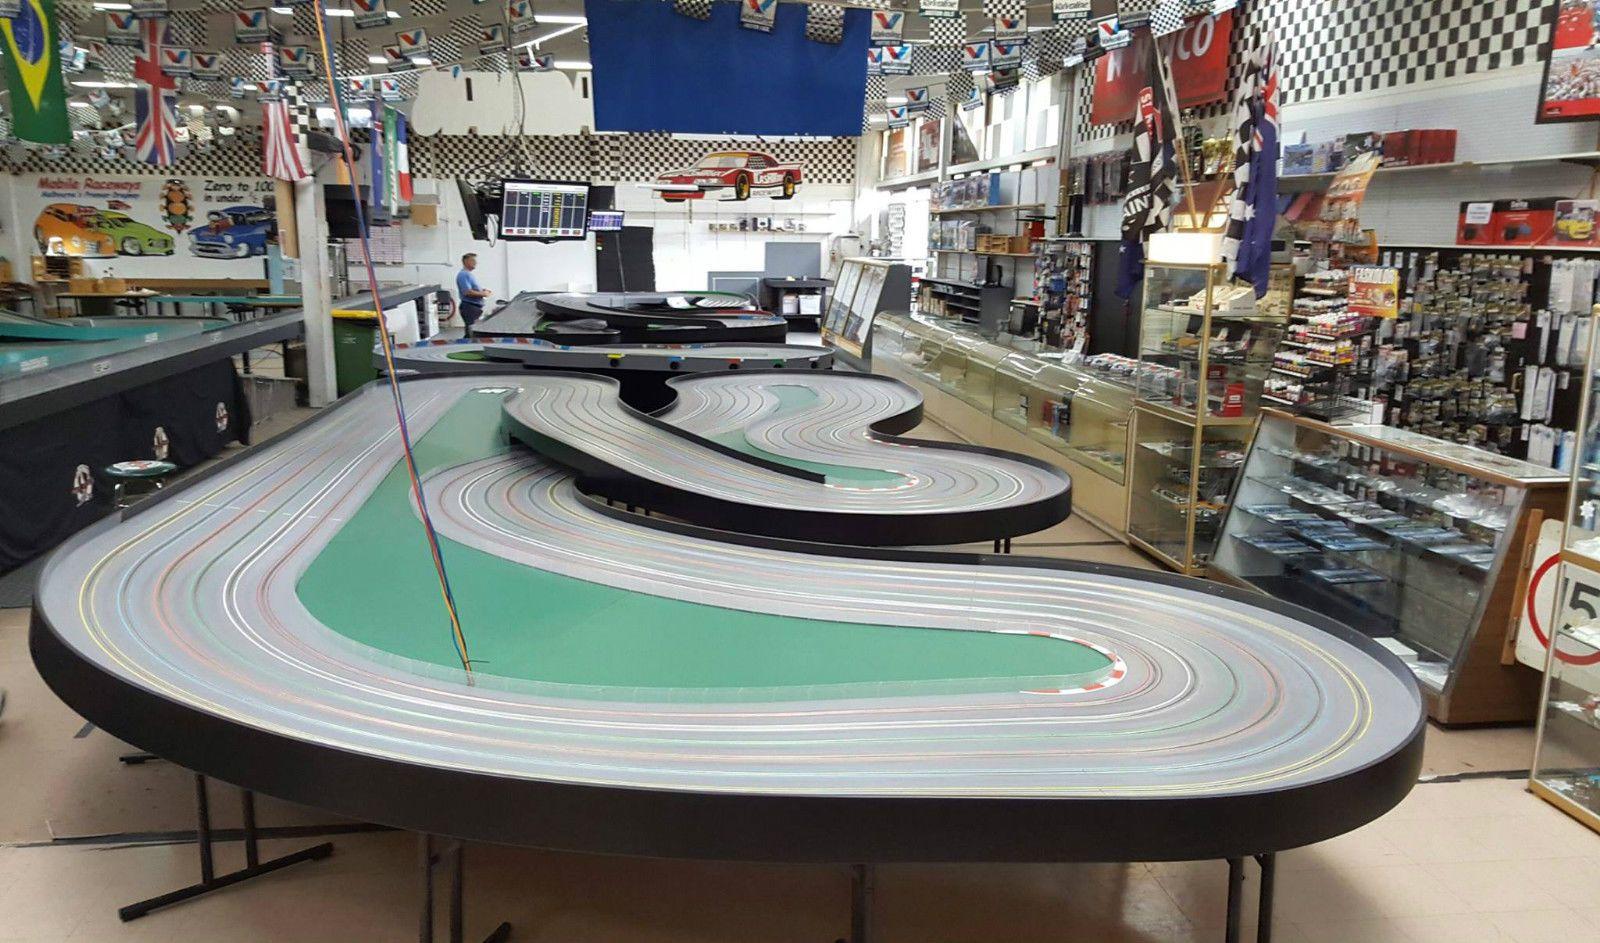 6 Lane Wooden Routed Slot Car Track eBay Slot car